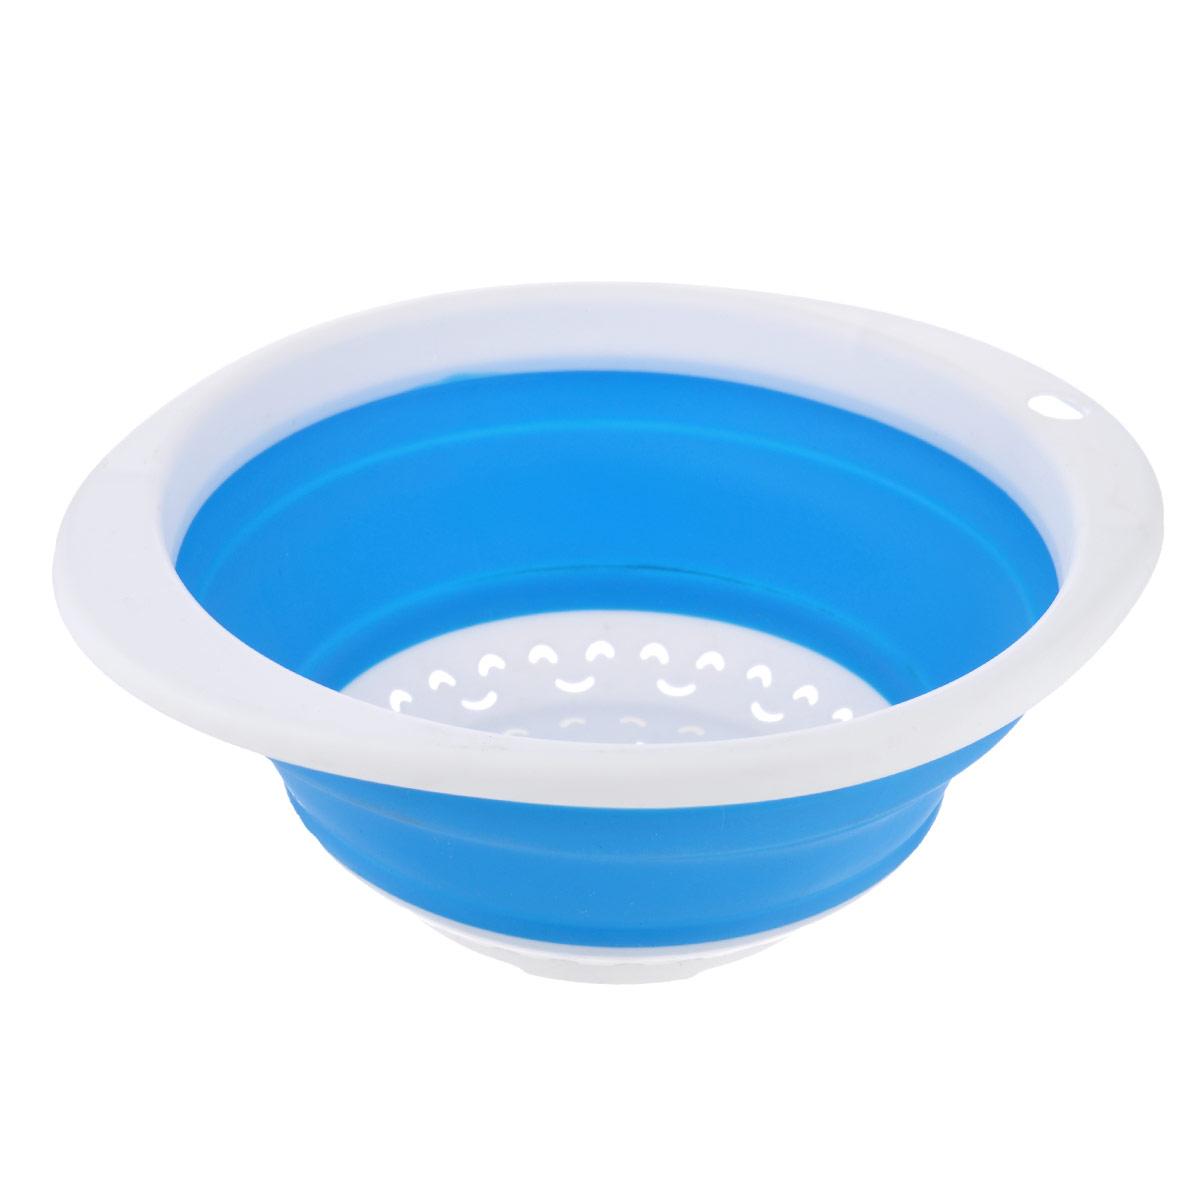 "Дуршлаг складной ""Oriental Way"", цвет: голубой, 23 х 21 см"